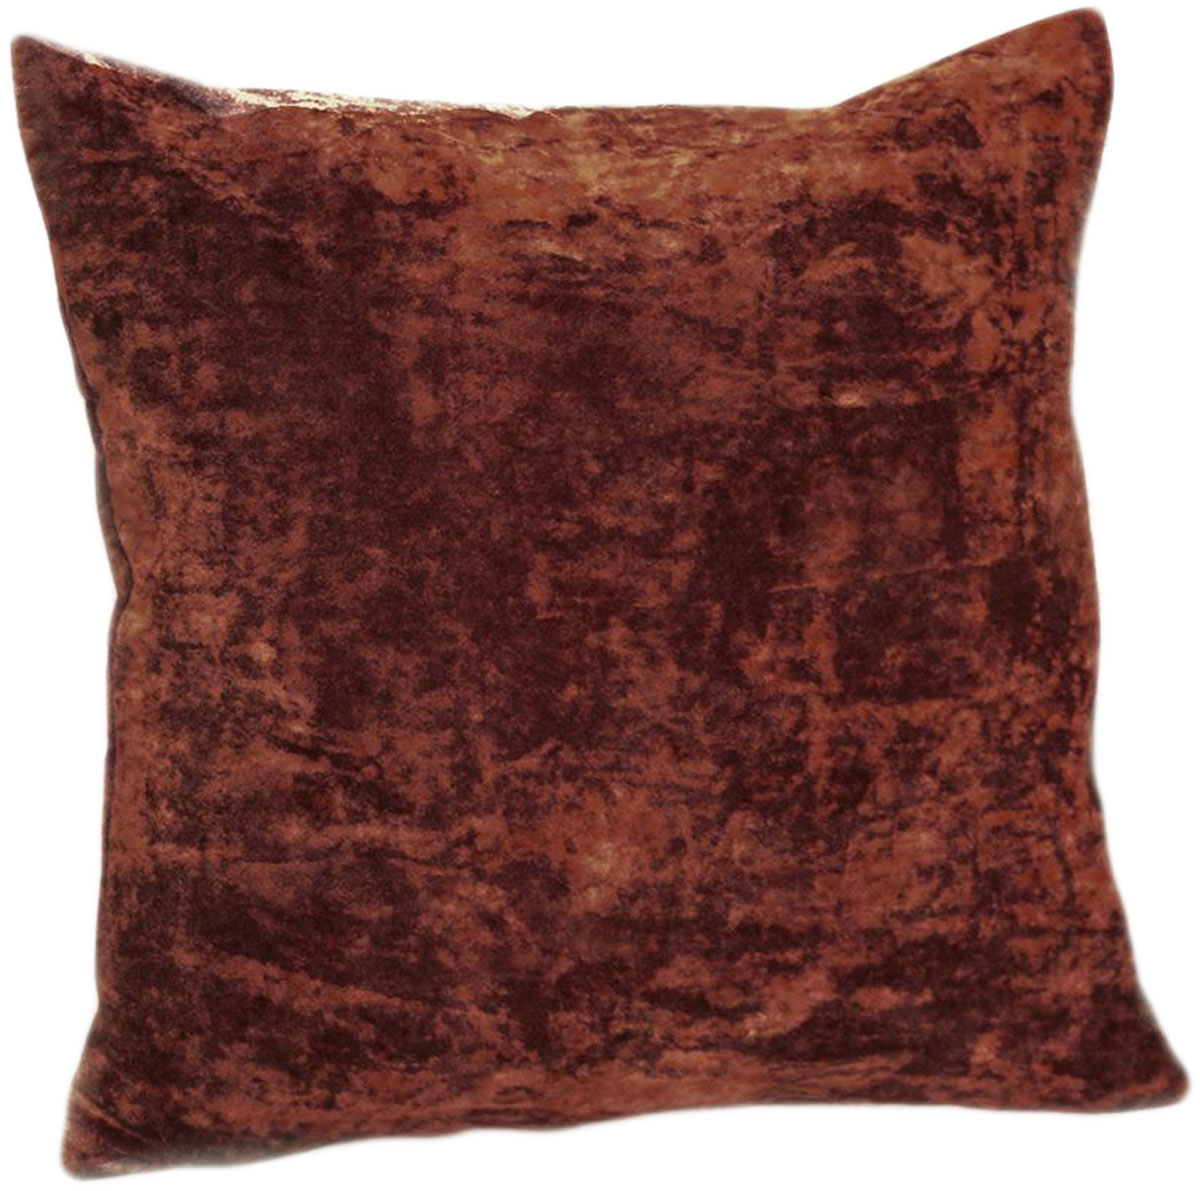 Подушка декоративная KauffOrt Бархат, цвет: бордово-коричневый, 40 x 40 см штора легкая kauffort barolo